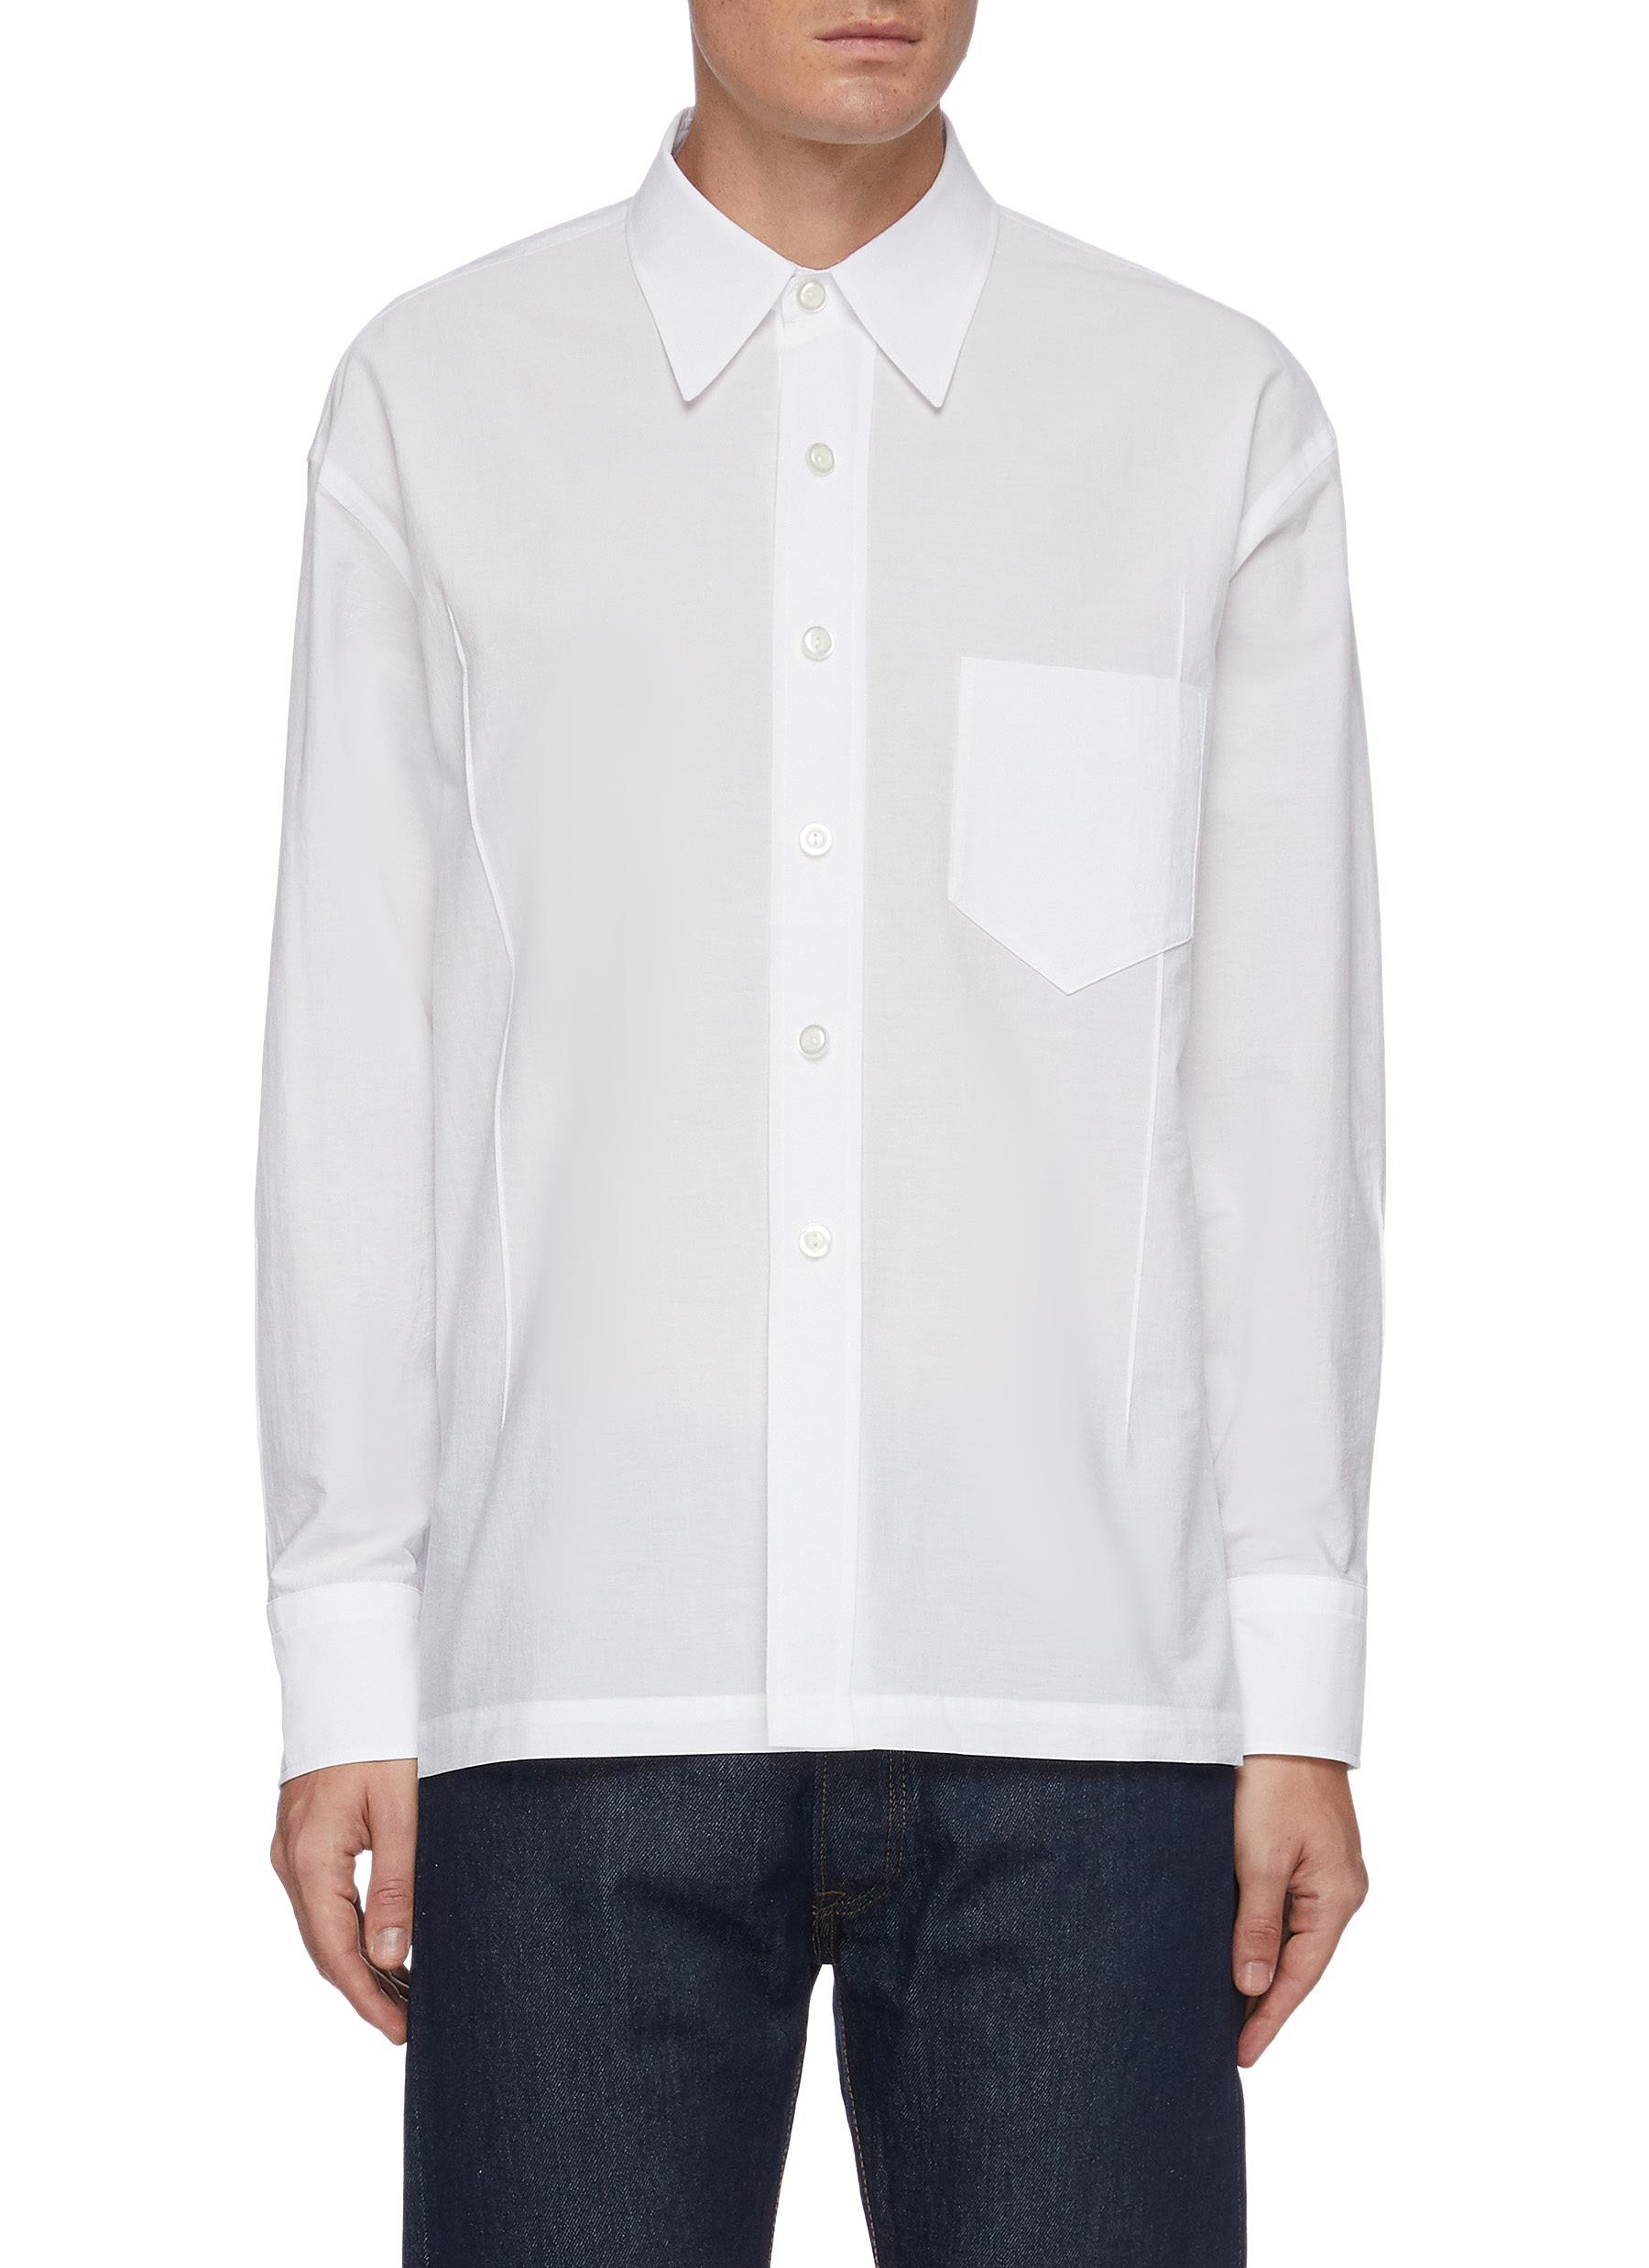 'Cuboid' tailored cotton shirt